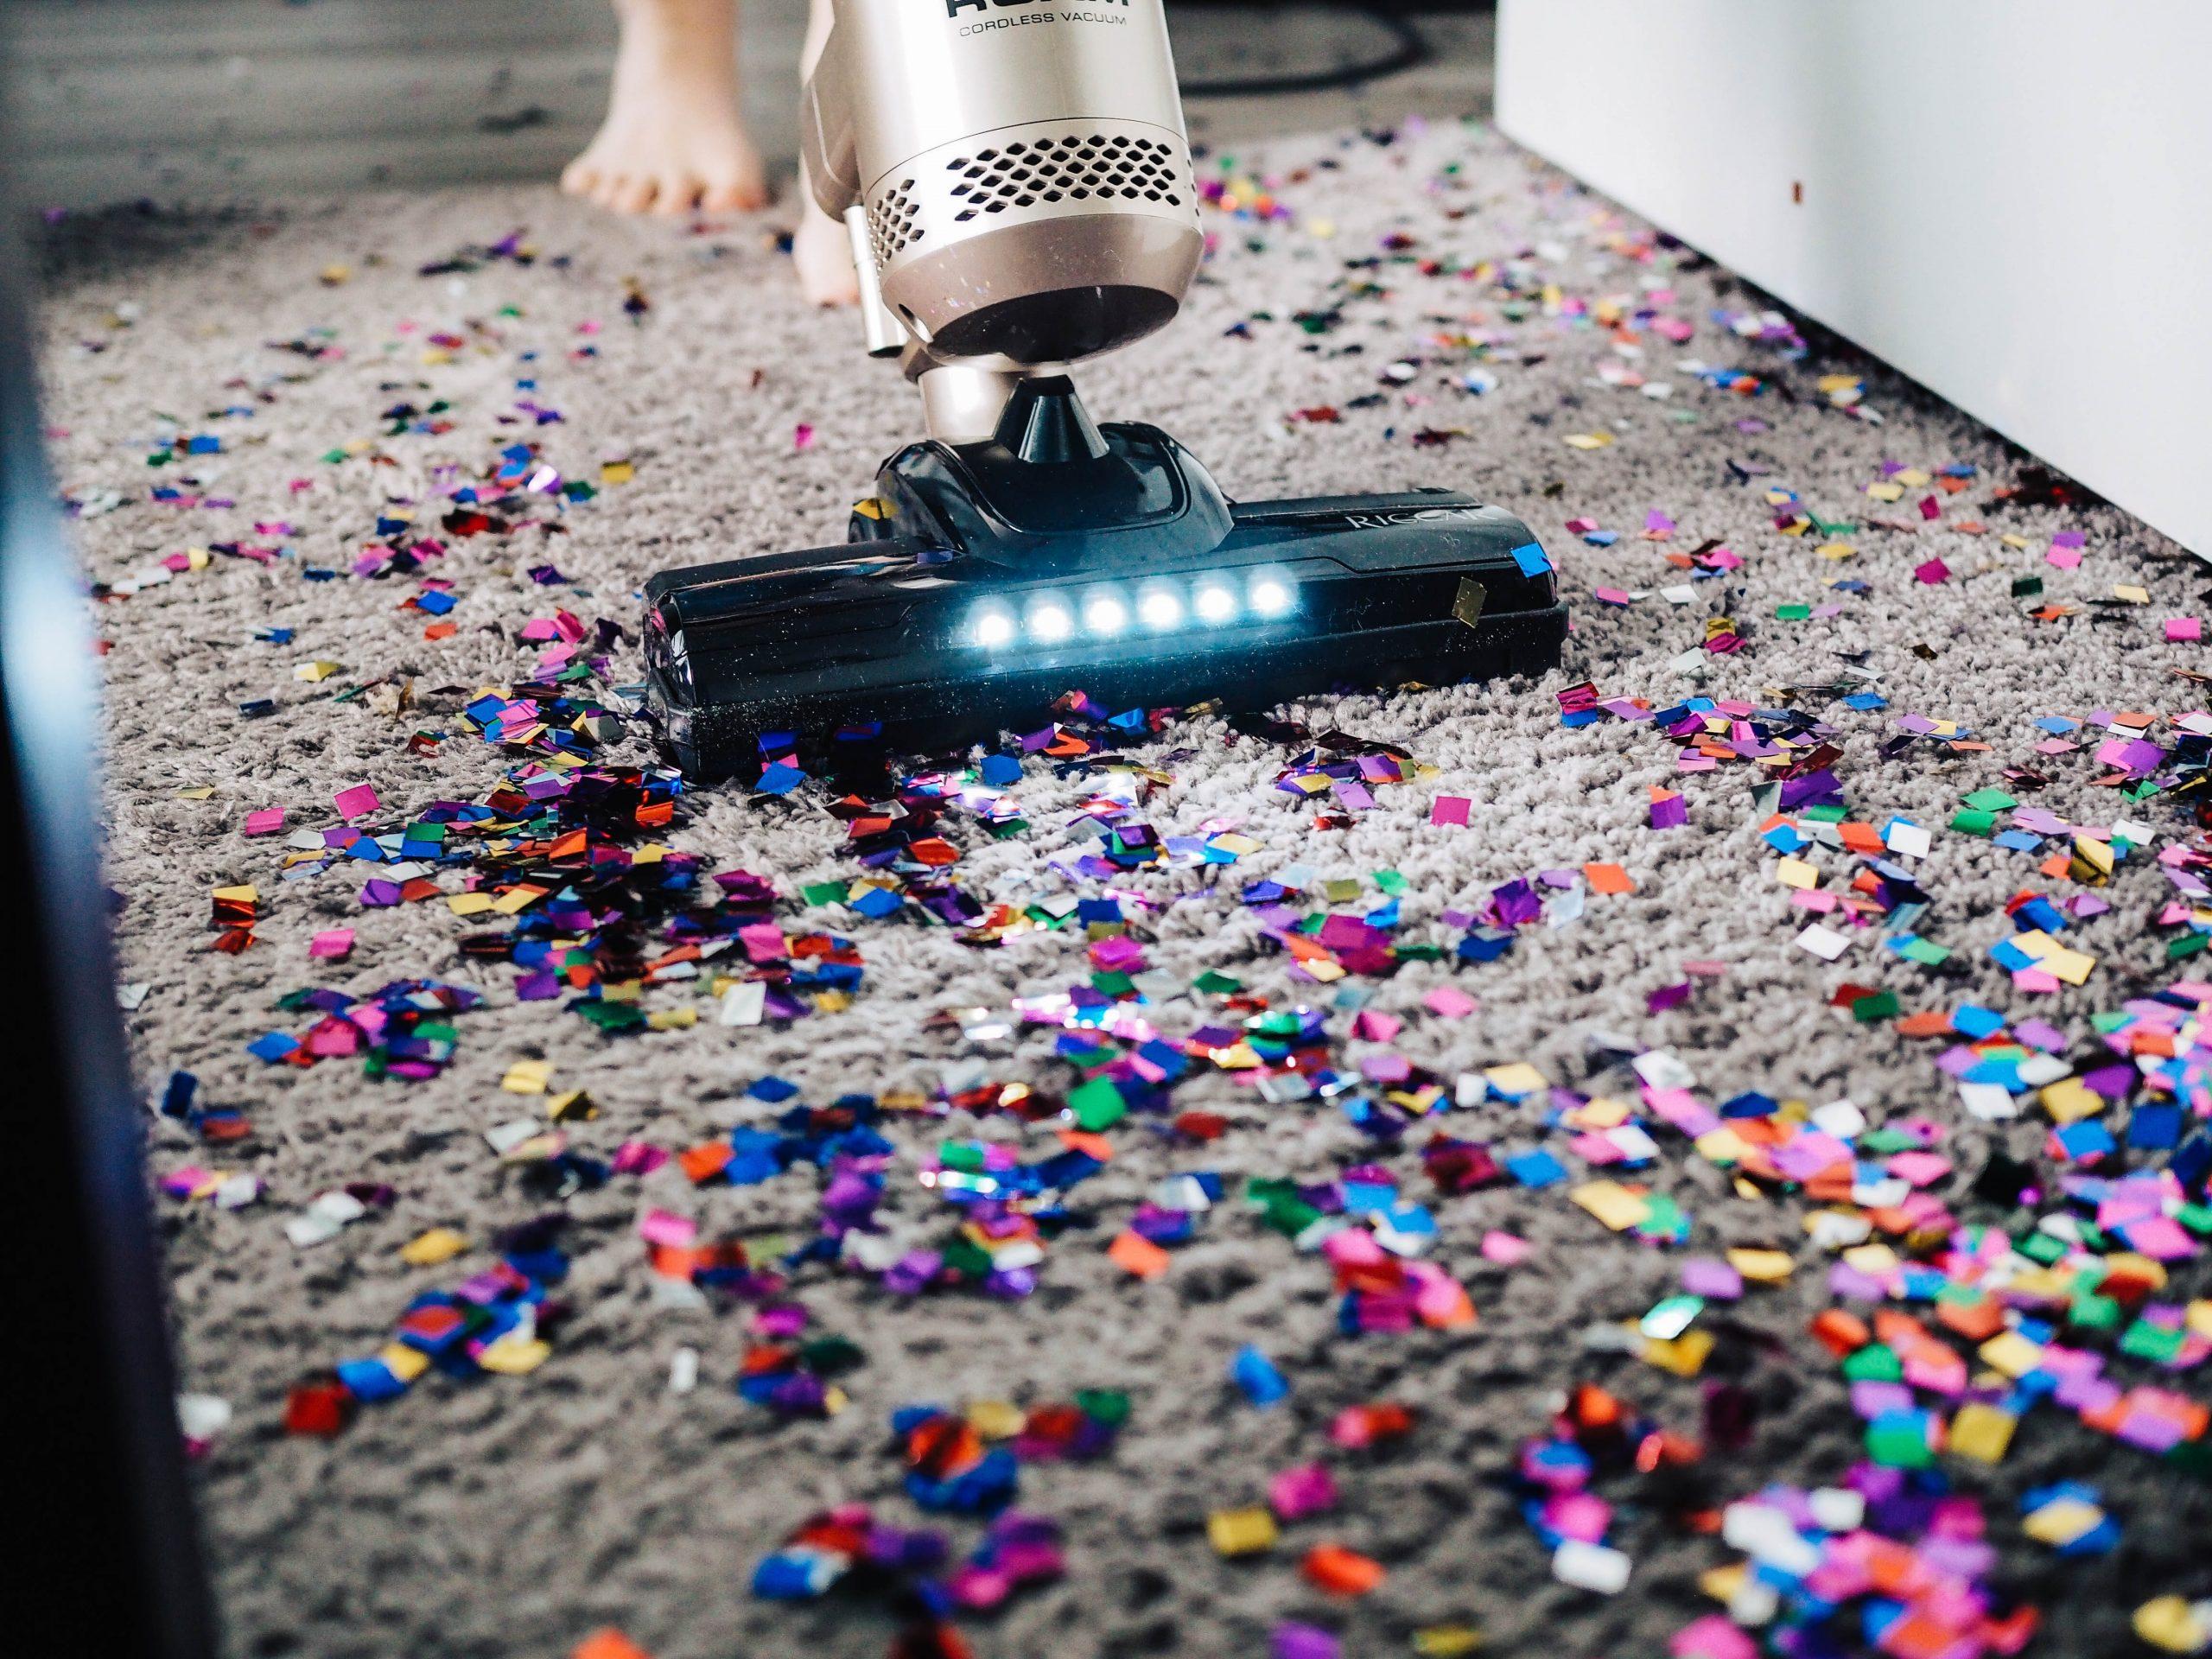 Aspiradora limpiando alfombra muy sucia